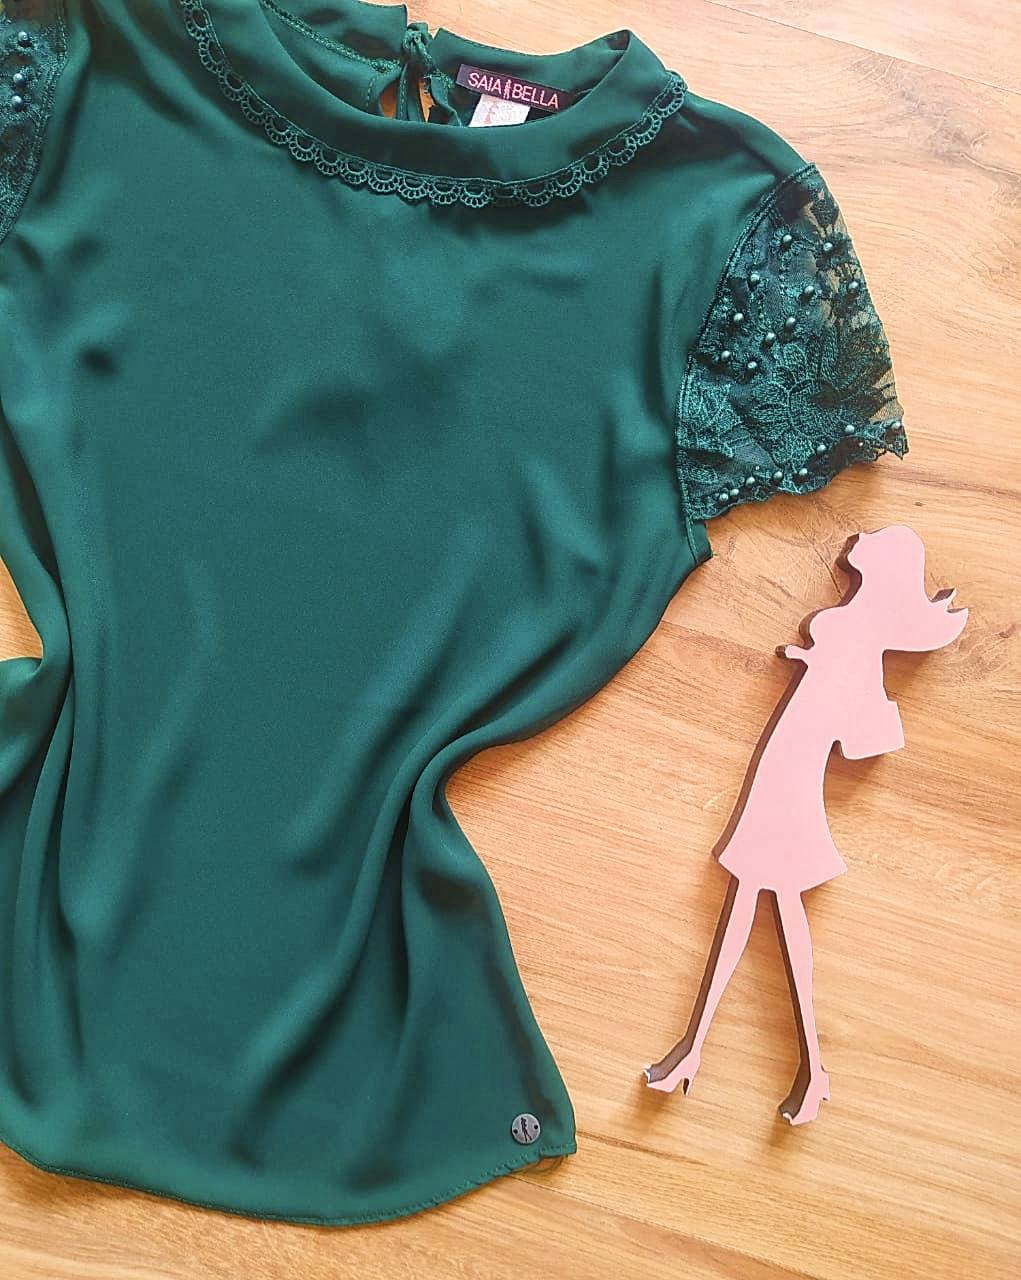 Blusa Clarisse de Renda Saia Bella - SB840701 -  Verde